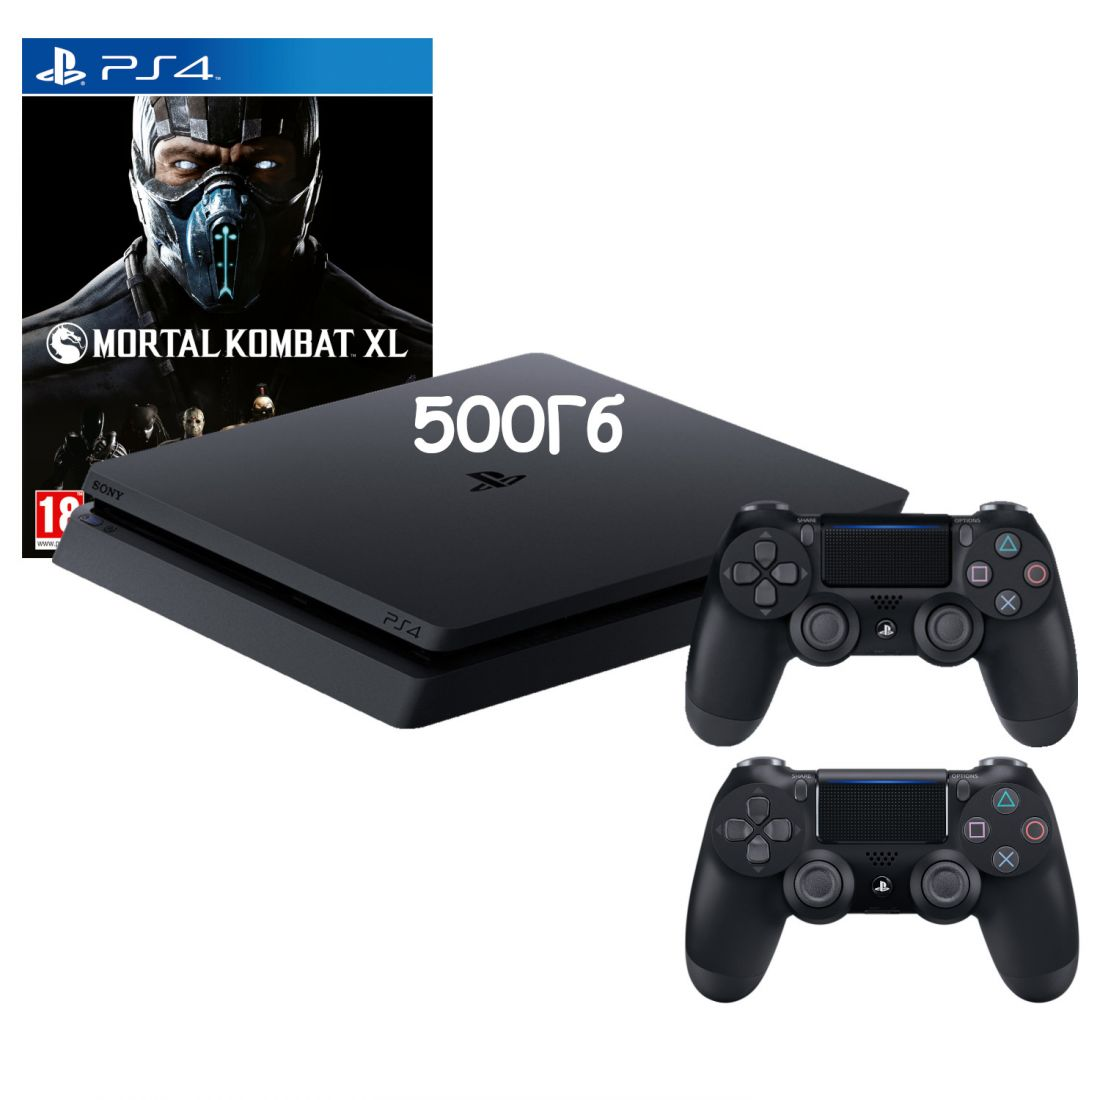 Sony PlayStation 4 Slim 500 ГБ + Доп. джойстик + игра Mortal Kombat